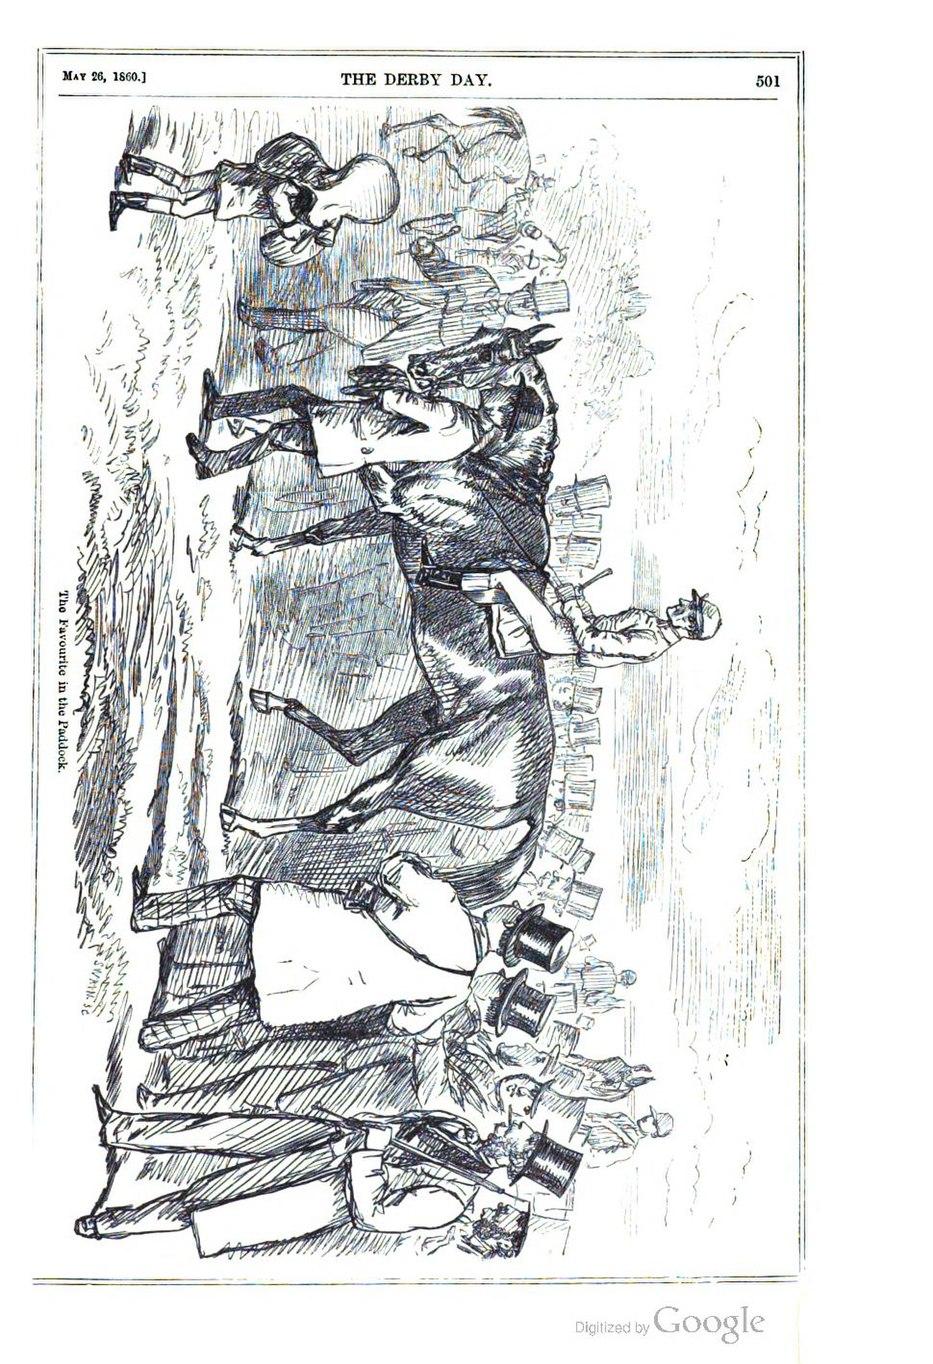 Page:Once a Week, Series 1, Volume II Dec 1859 to June